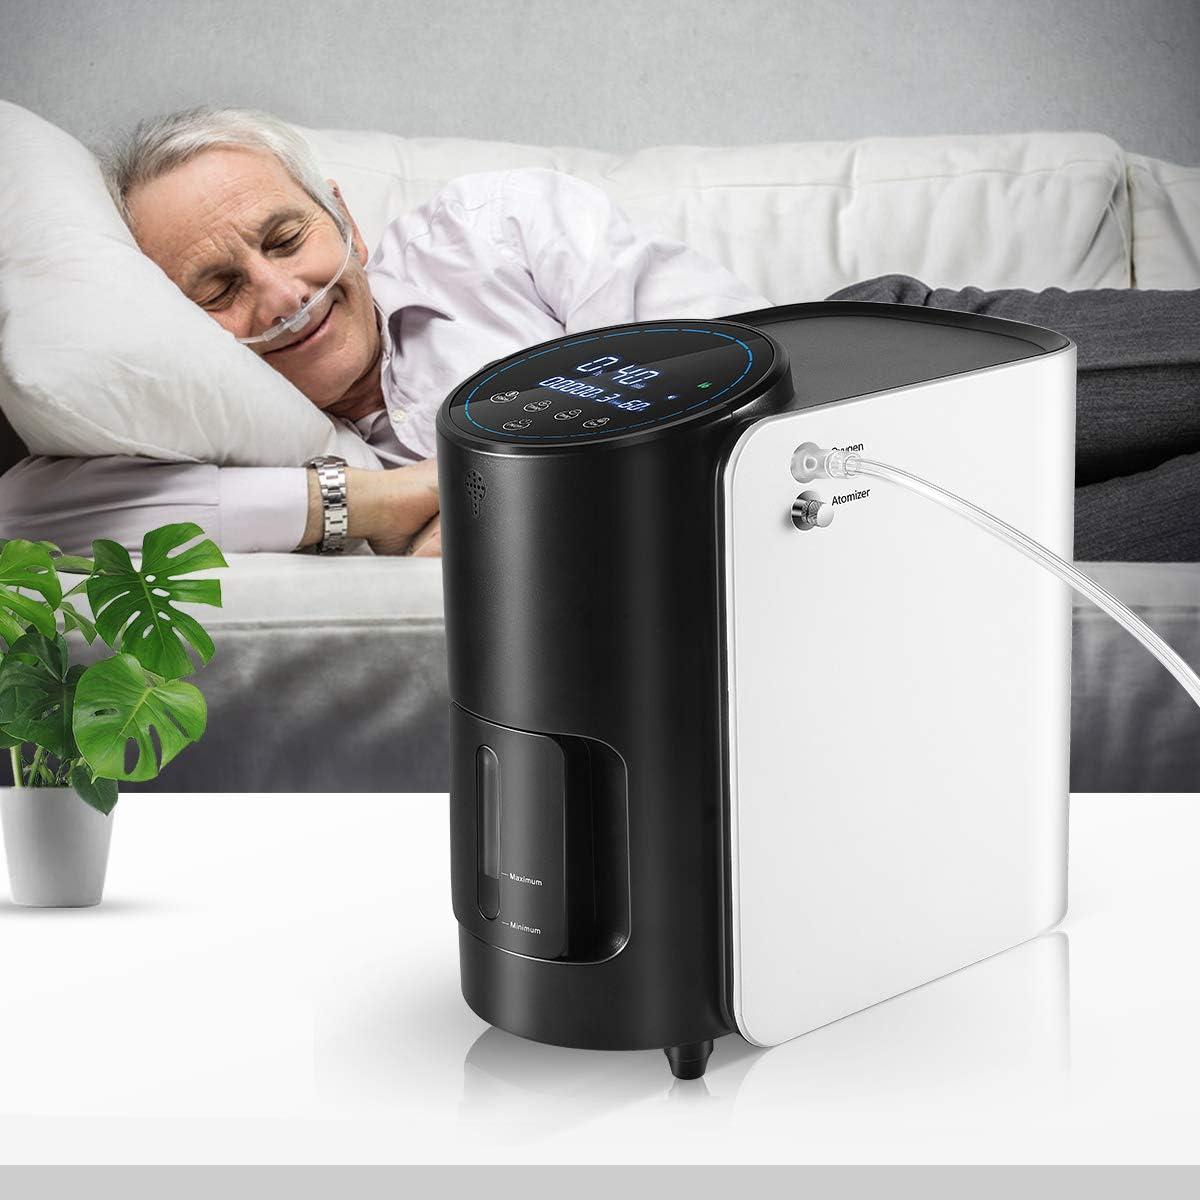 InLoveArts Generador de concentrador de oxígeno,máquina de oxígeno ajustable 1-7L/min,portatil purificador de aire para el hogar 90% de flujo de alta pureza AC 220V